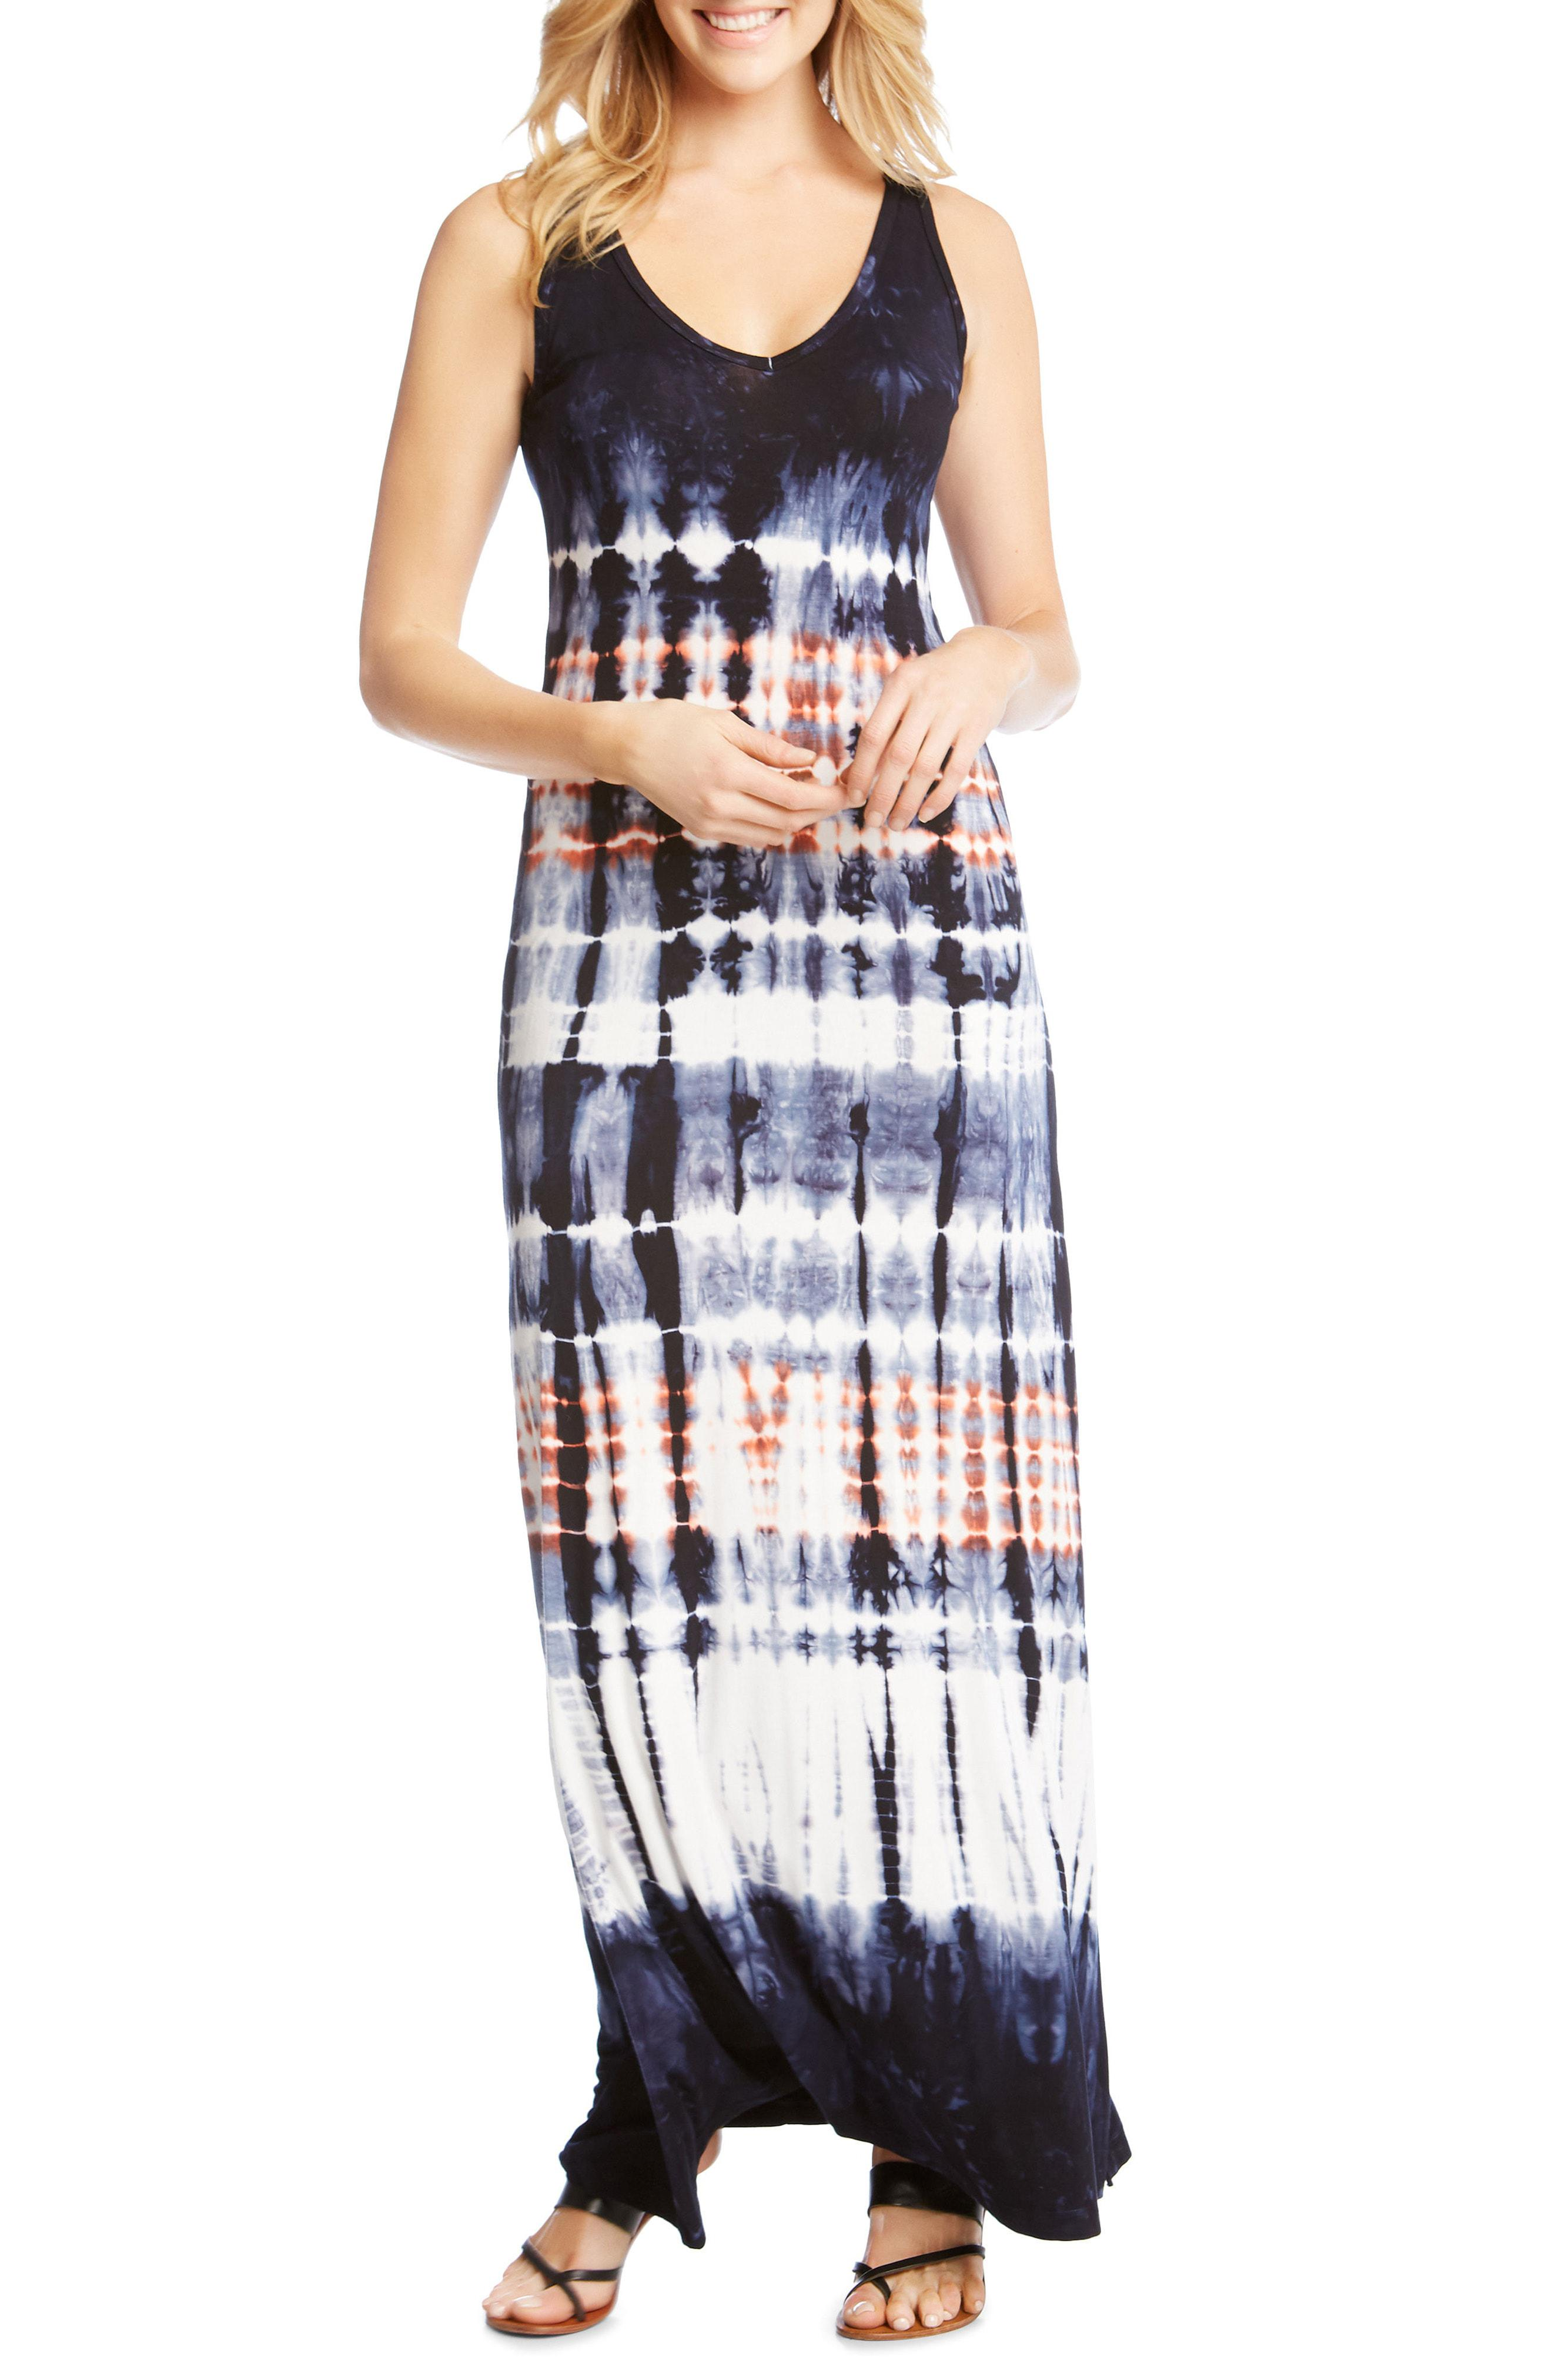 b3a87e23989 Lyst - Karen Kane V-neck Tie Dye Maxi Dress in Black